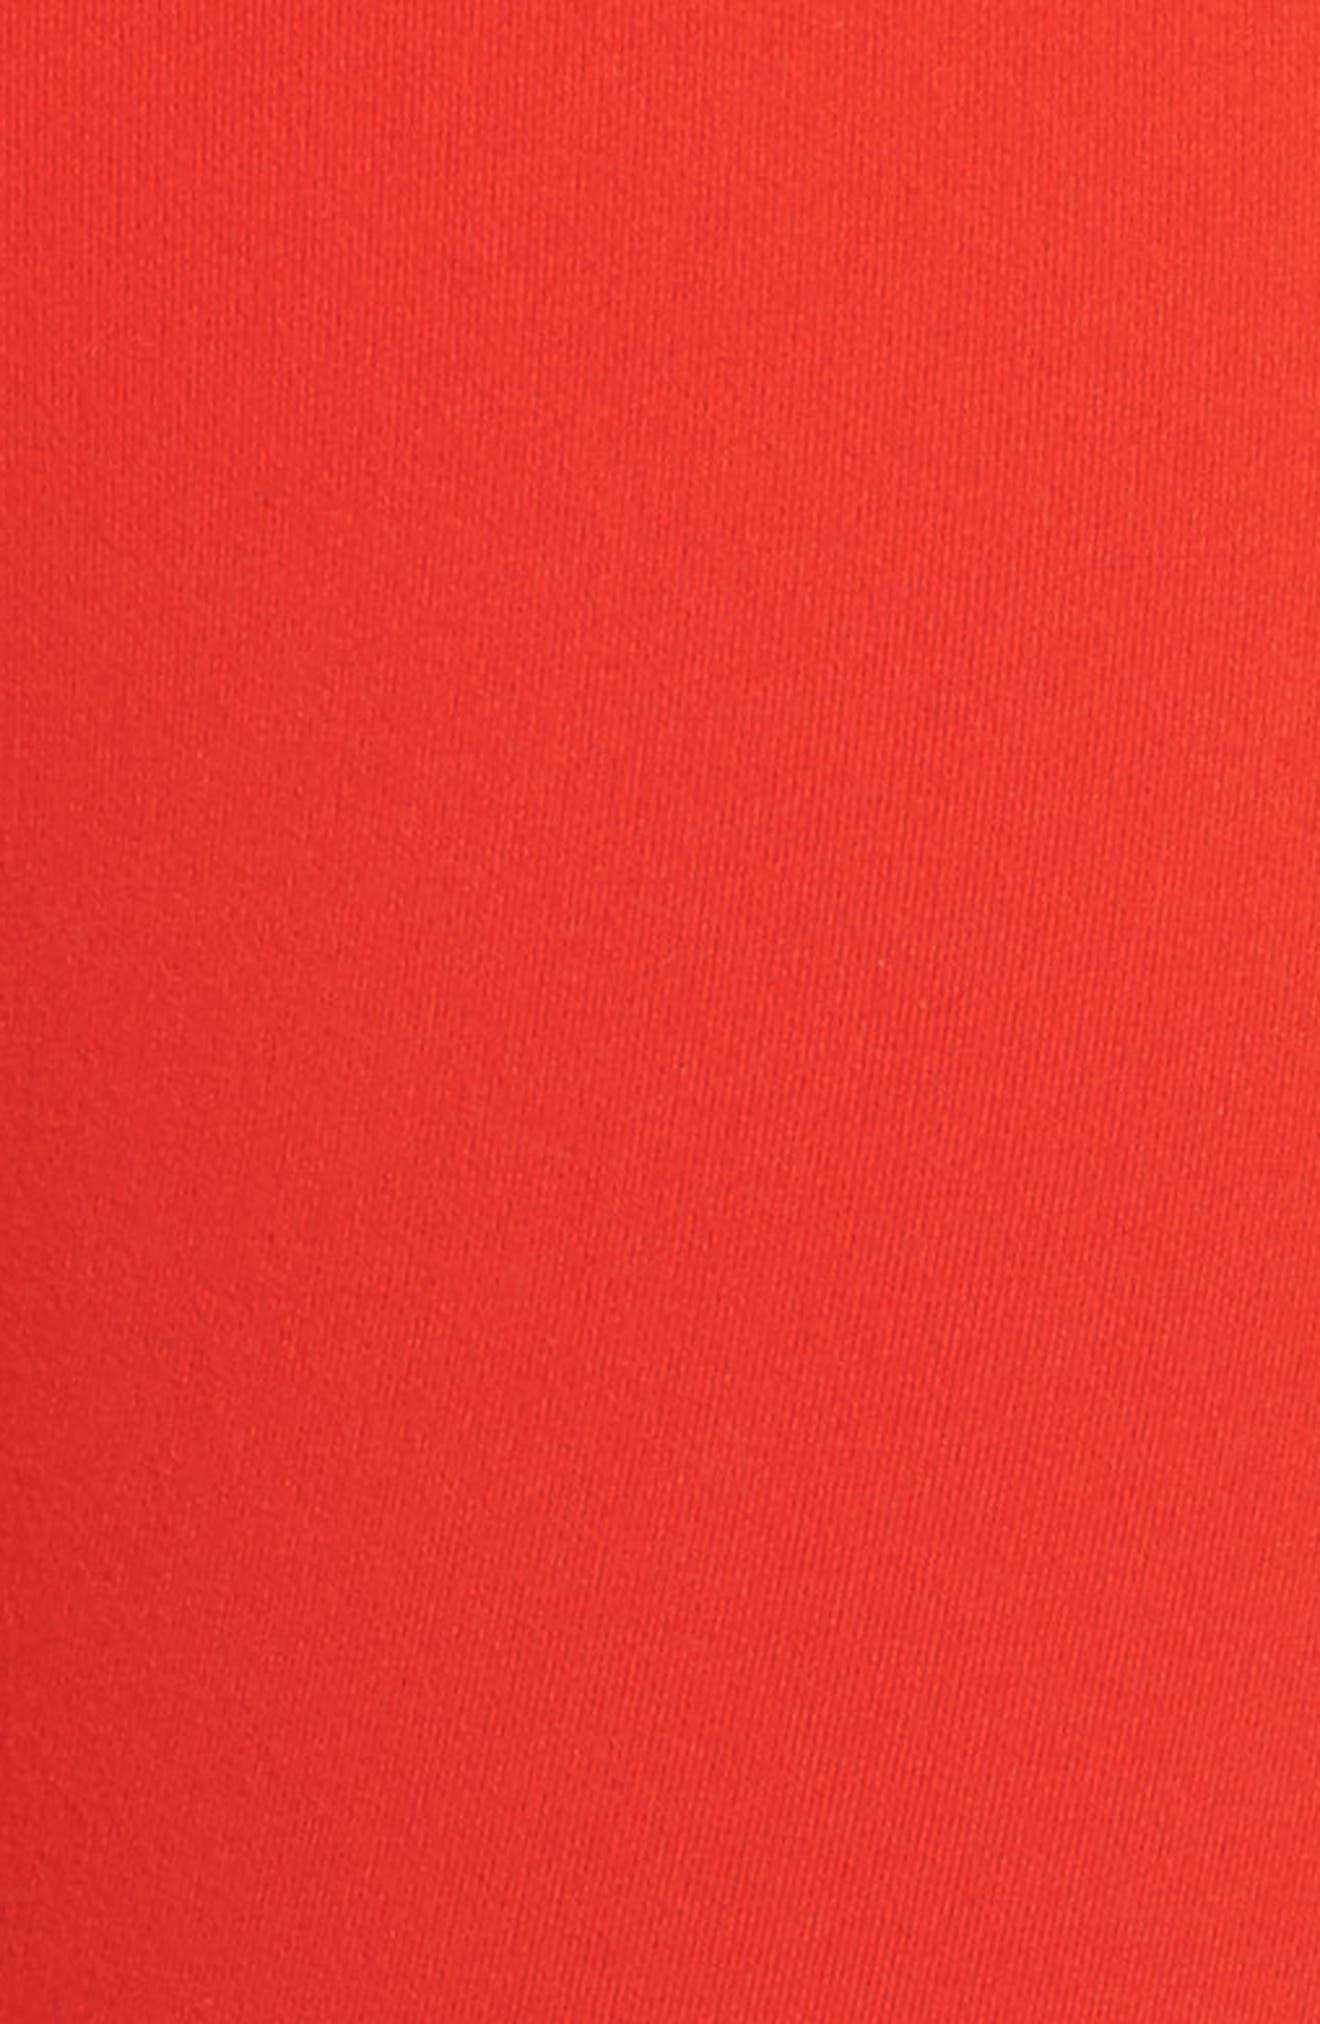 Live In Midi Leggings,                             Alternate thumbnail 6, color,                             Red Fiery